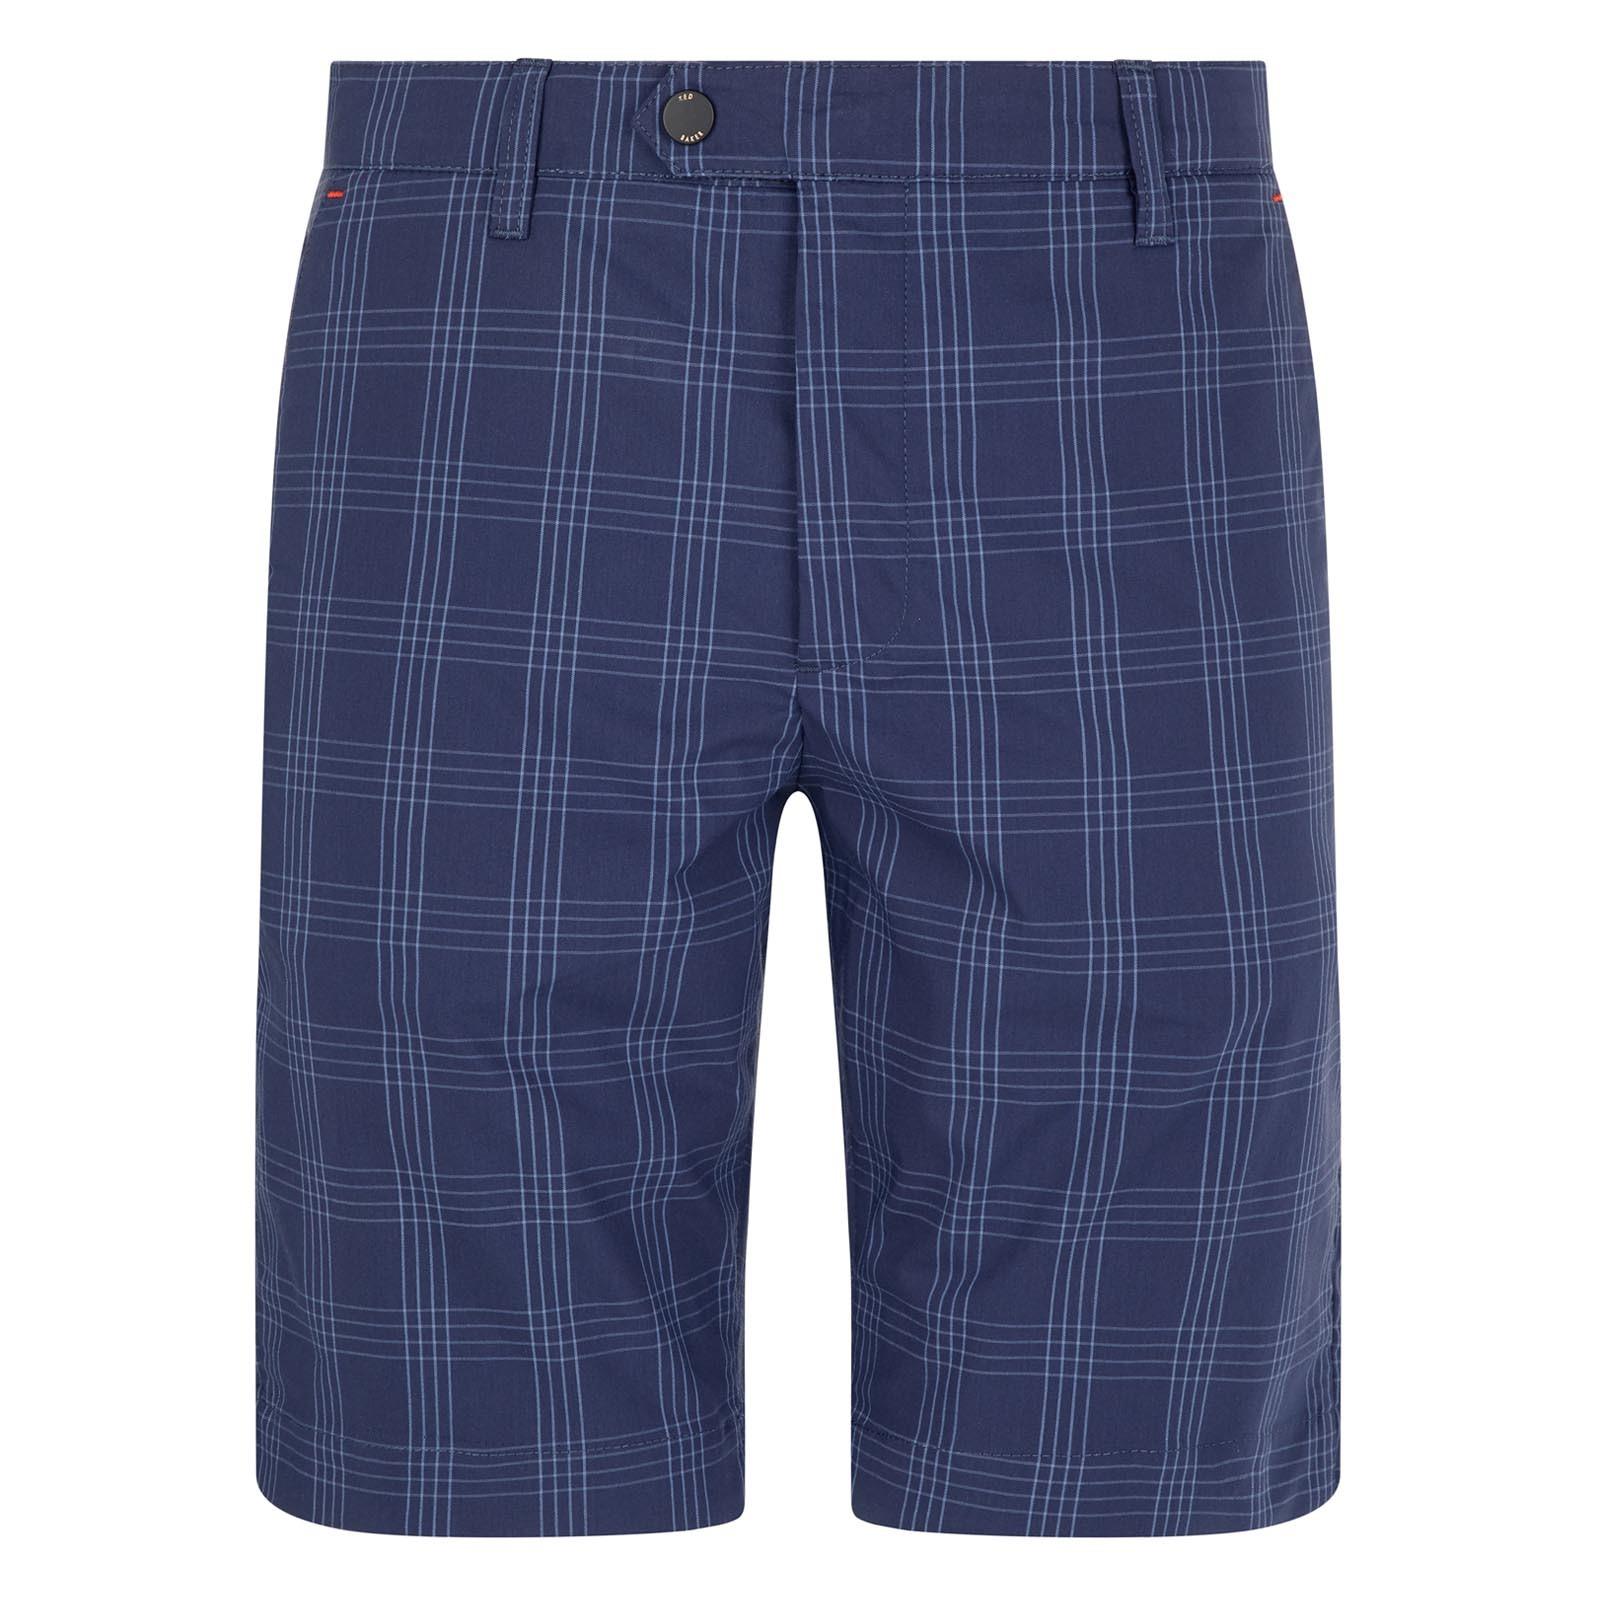 Ted Baker Golf TwoPak Shorts